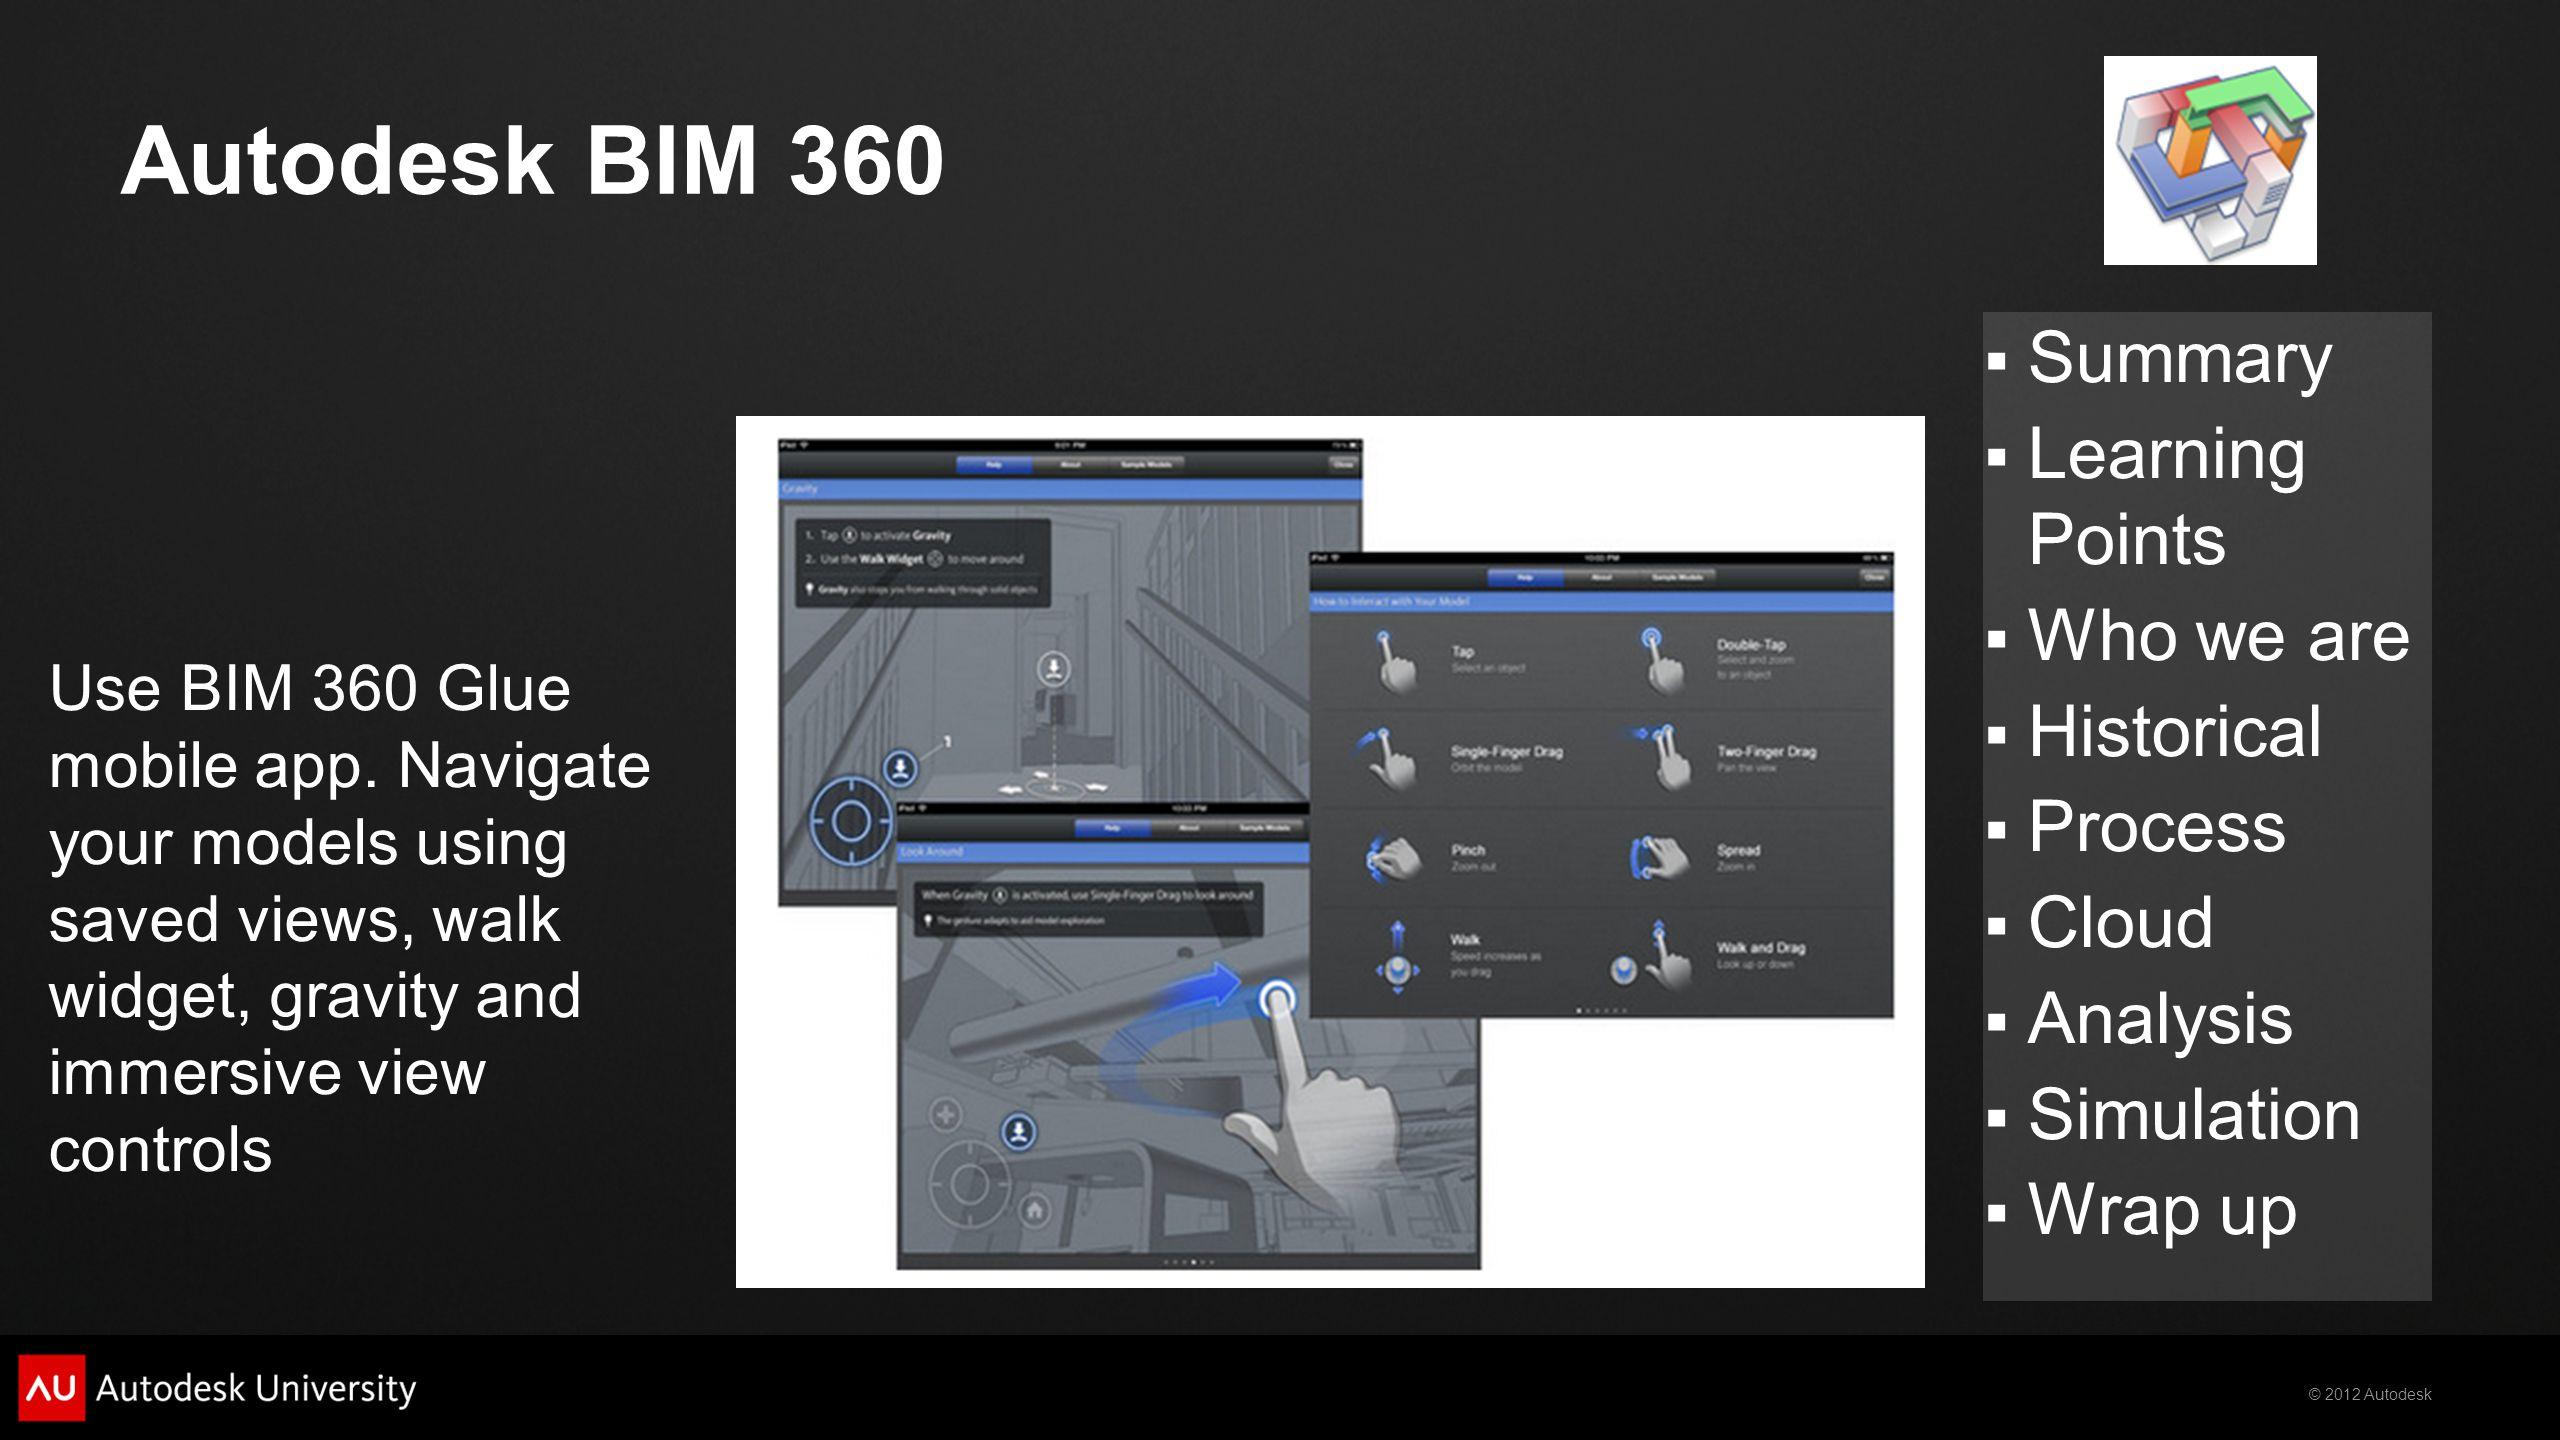 © 2012 Autodesk  Summary  Learning Points  Who we are  Historical  Process  Cloud  Analysis  Simulation  Wrap up Autodesk BIM 360 Use BIM 360